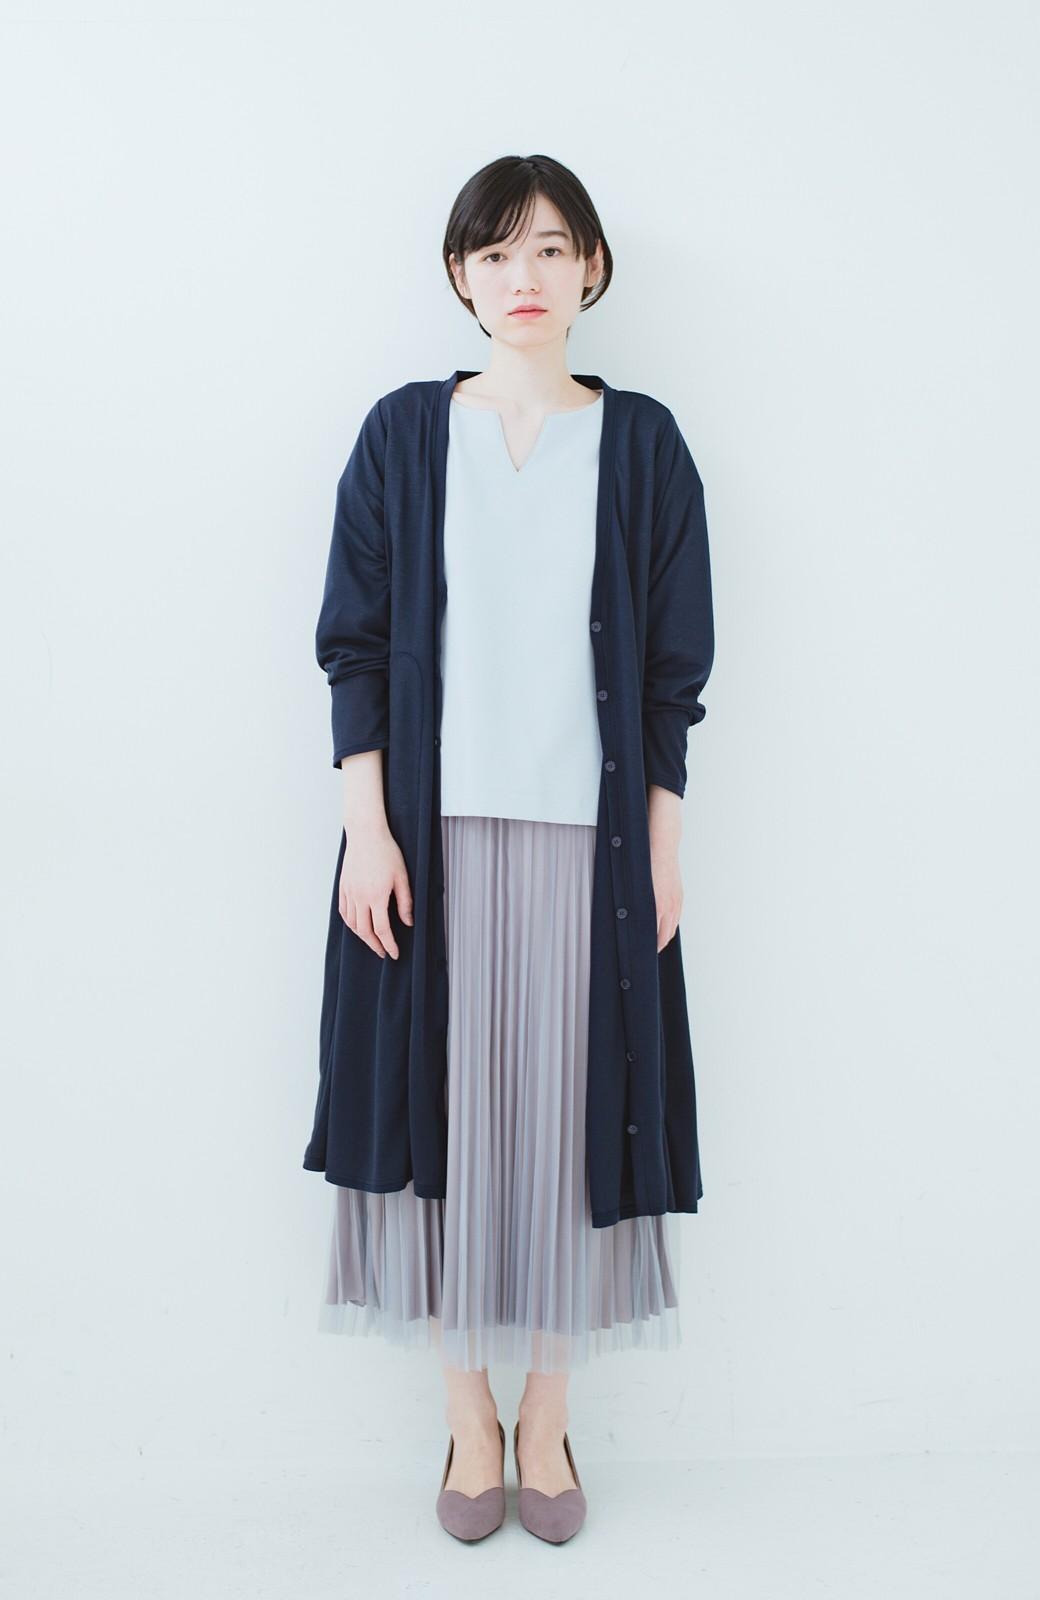 haco! どんな日も華やか気分にしてくれる 二枚仕立てのチュールプリーツスカート <ライトグレー>の商品写真16